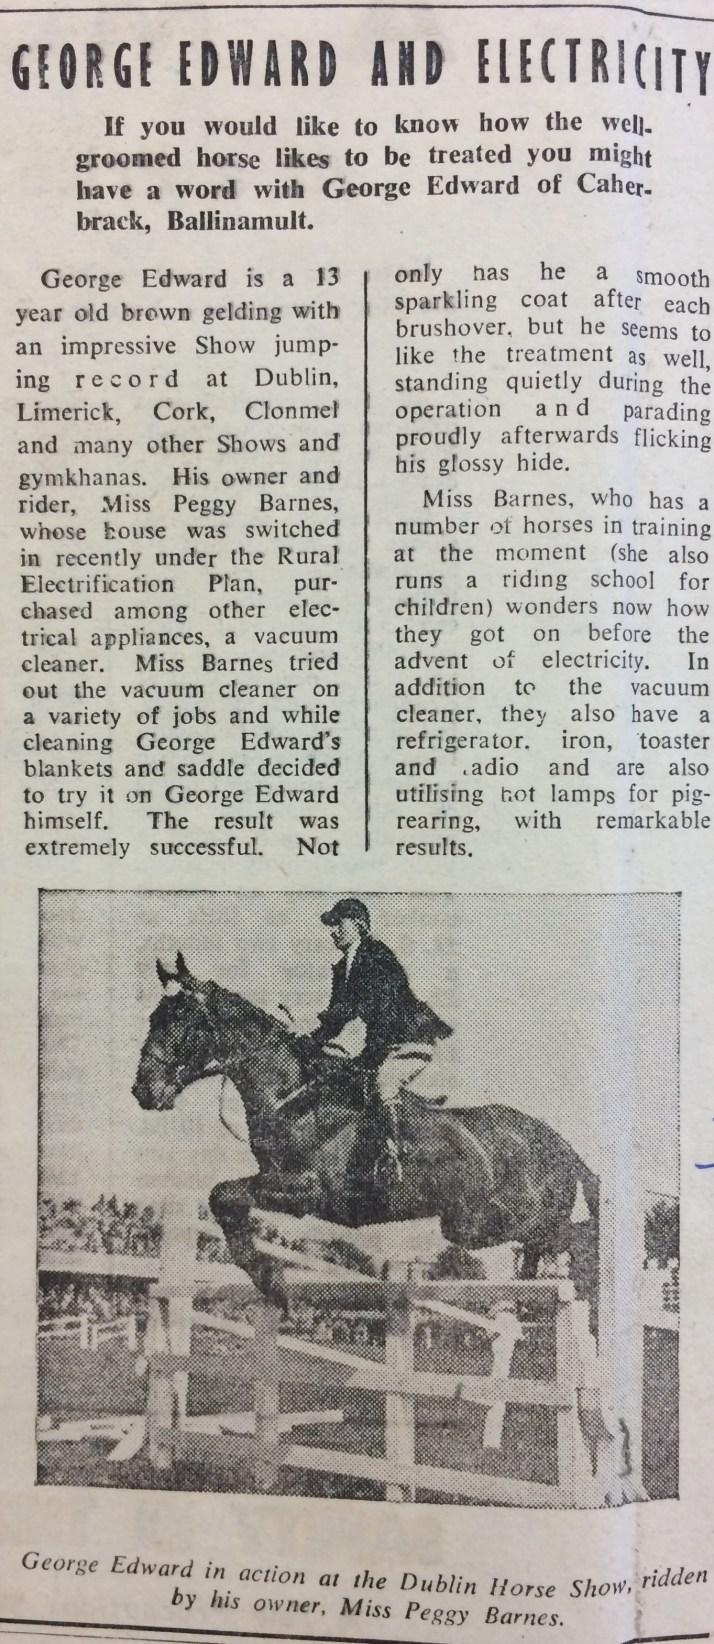 Electricity News, 1963